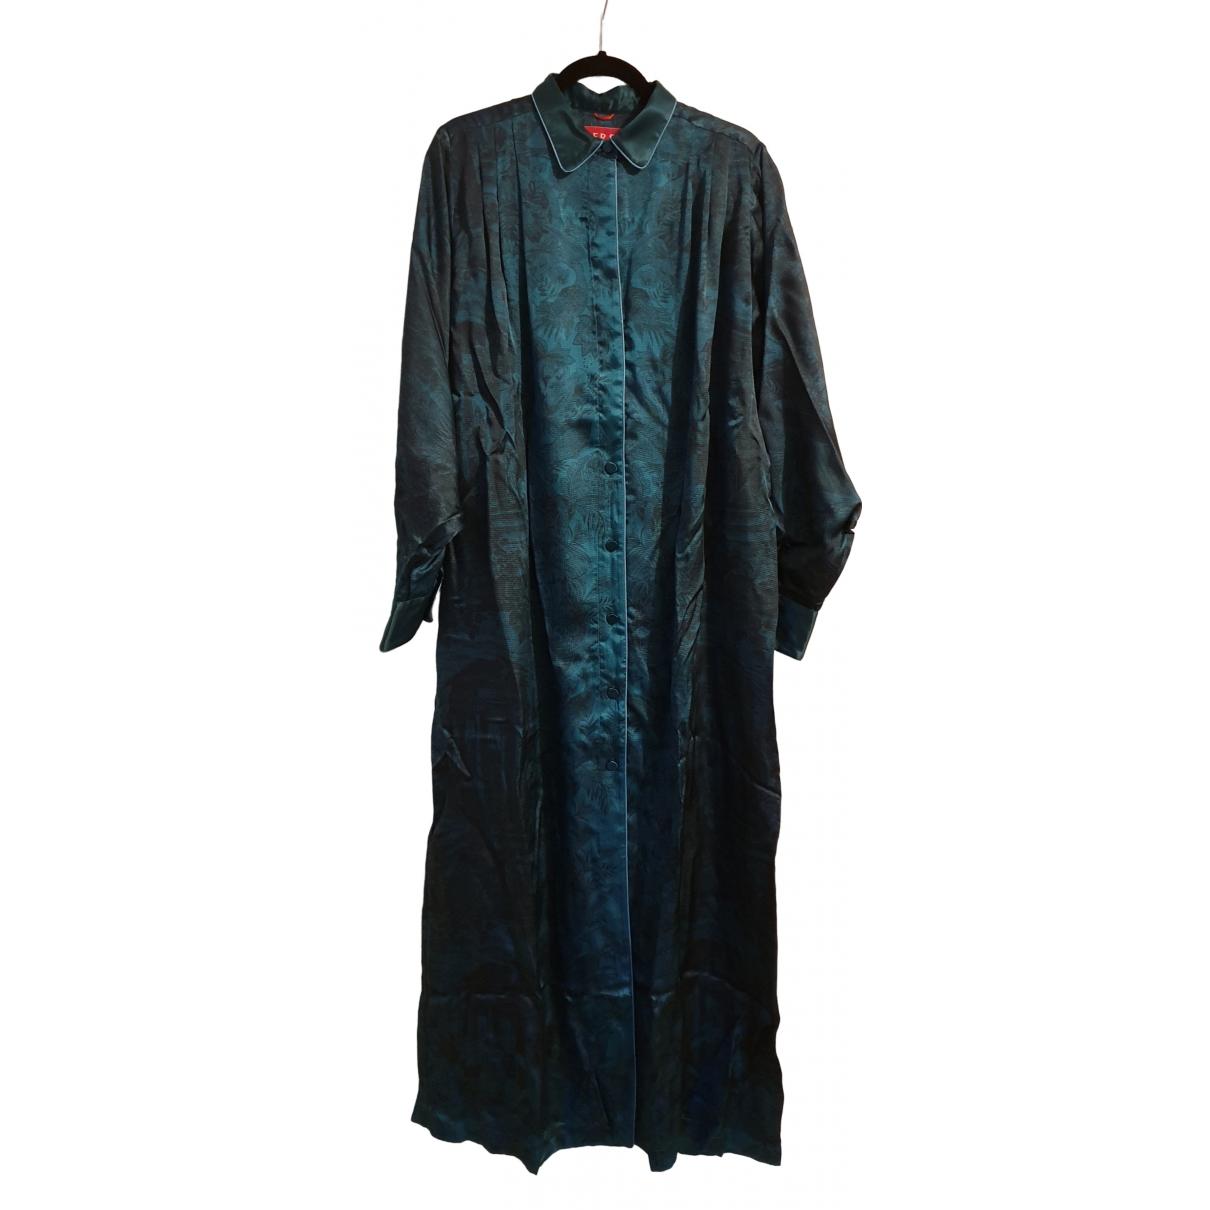 F.r.s For Restless Sleepers \N Green Silk dress for Women M International